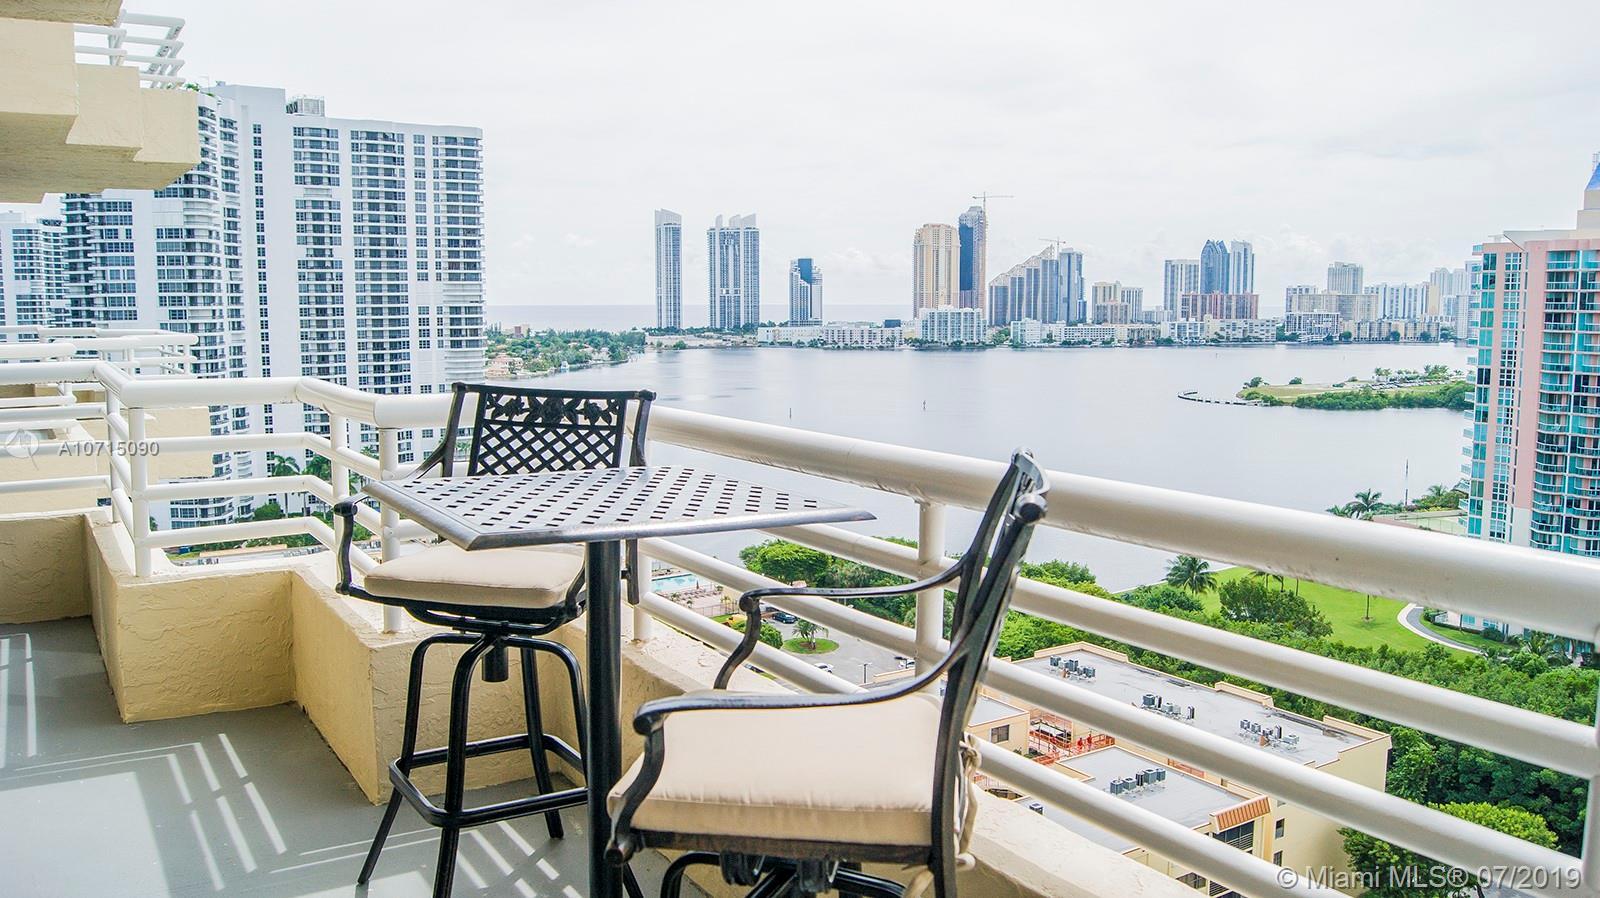 3300 NE 192nd St #LP14, Aventura, FL 33180 - Aventura, FL real estate listing